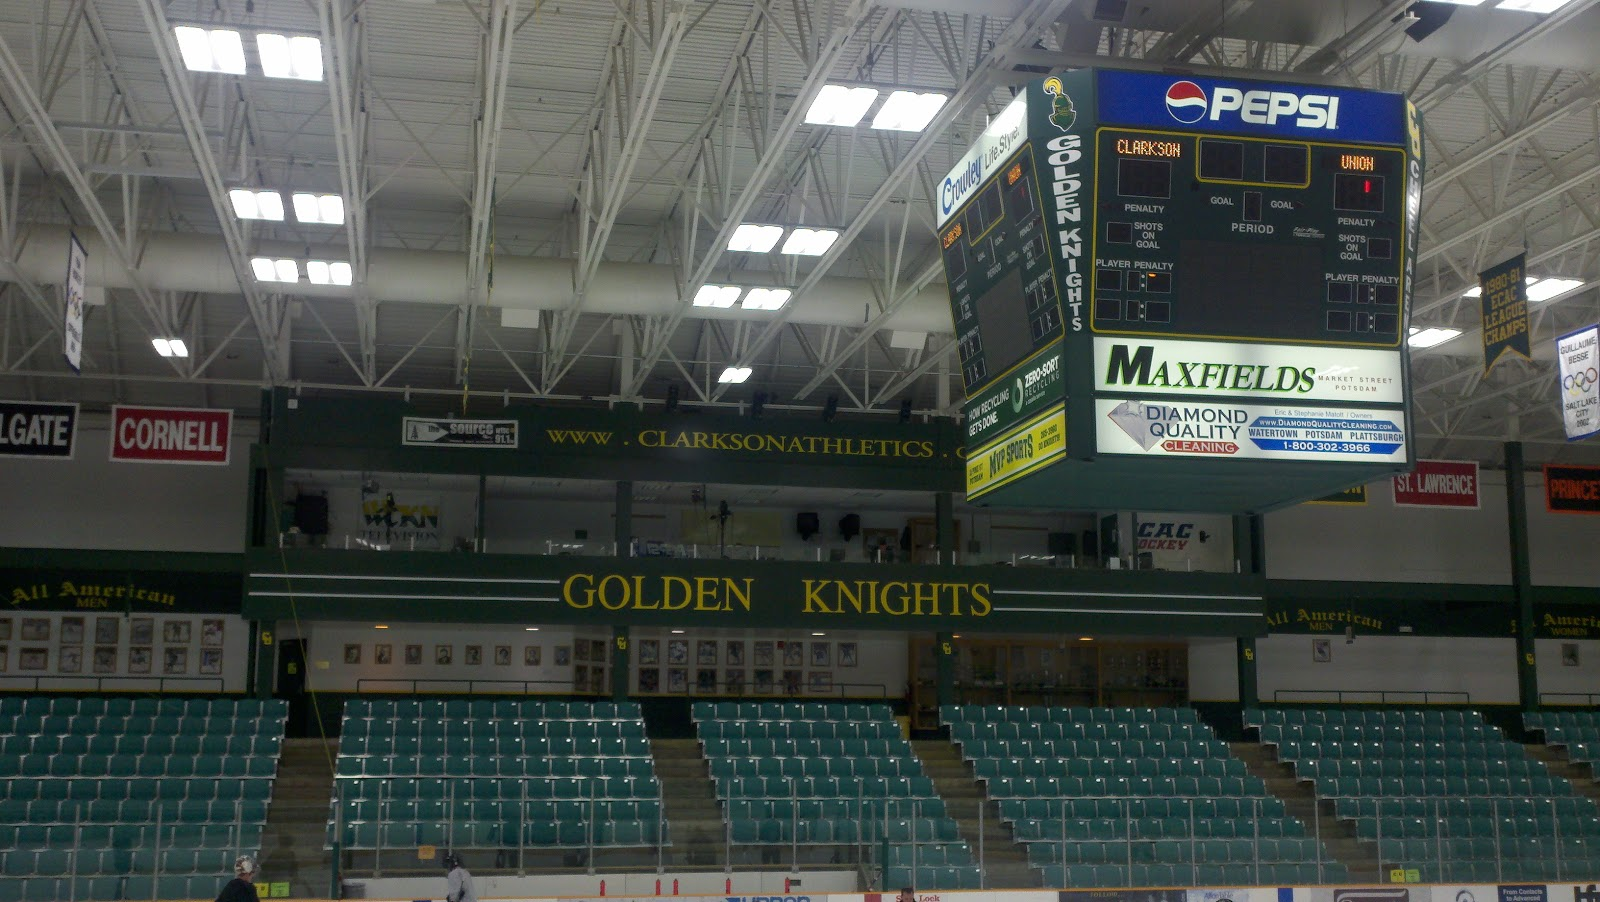 Cheel Arena, Clarkson University